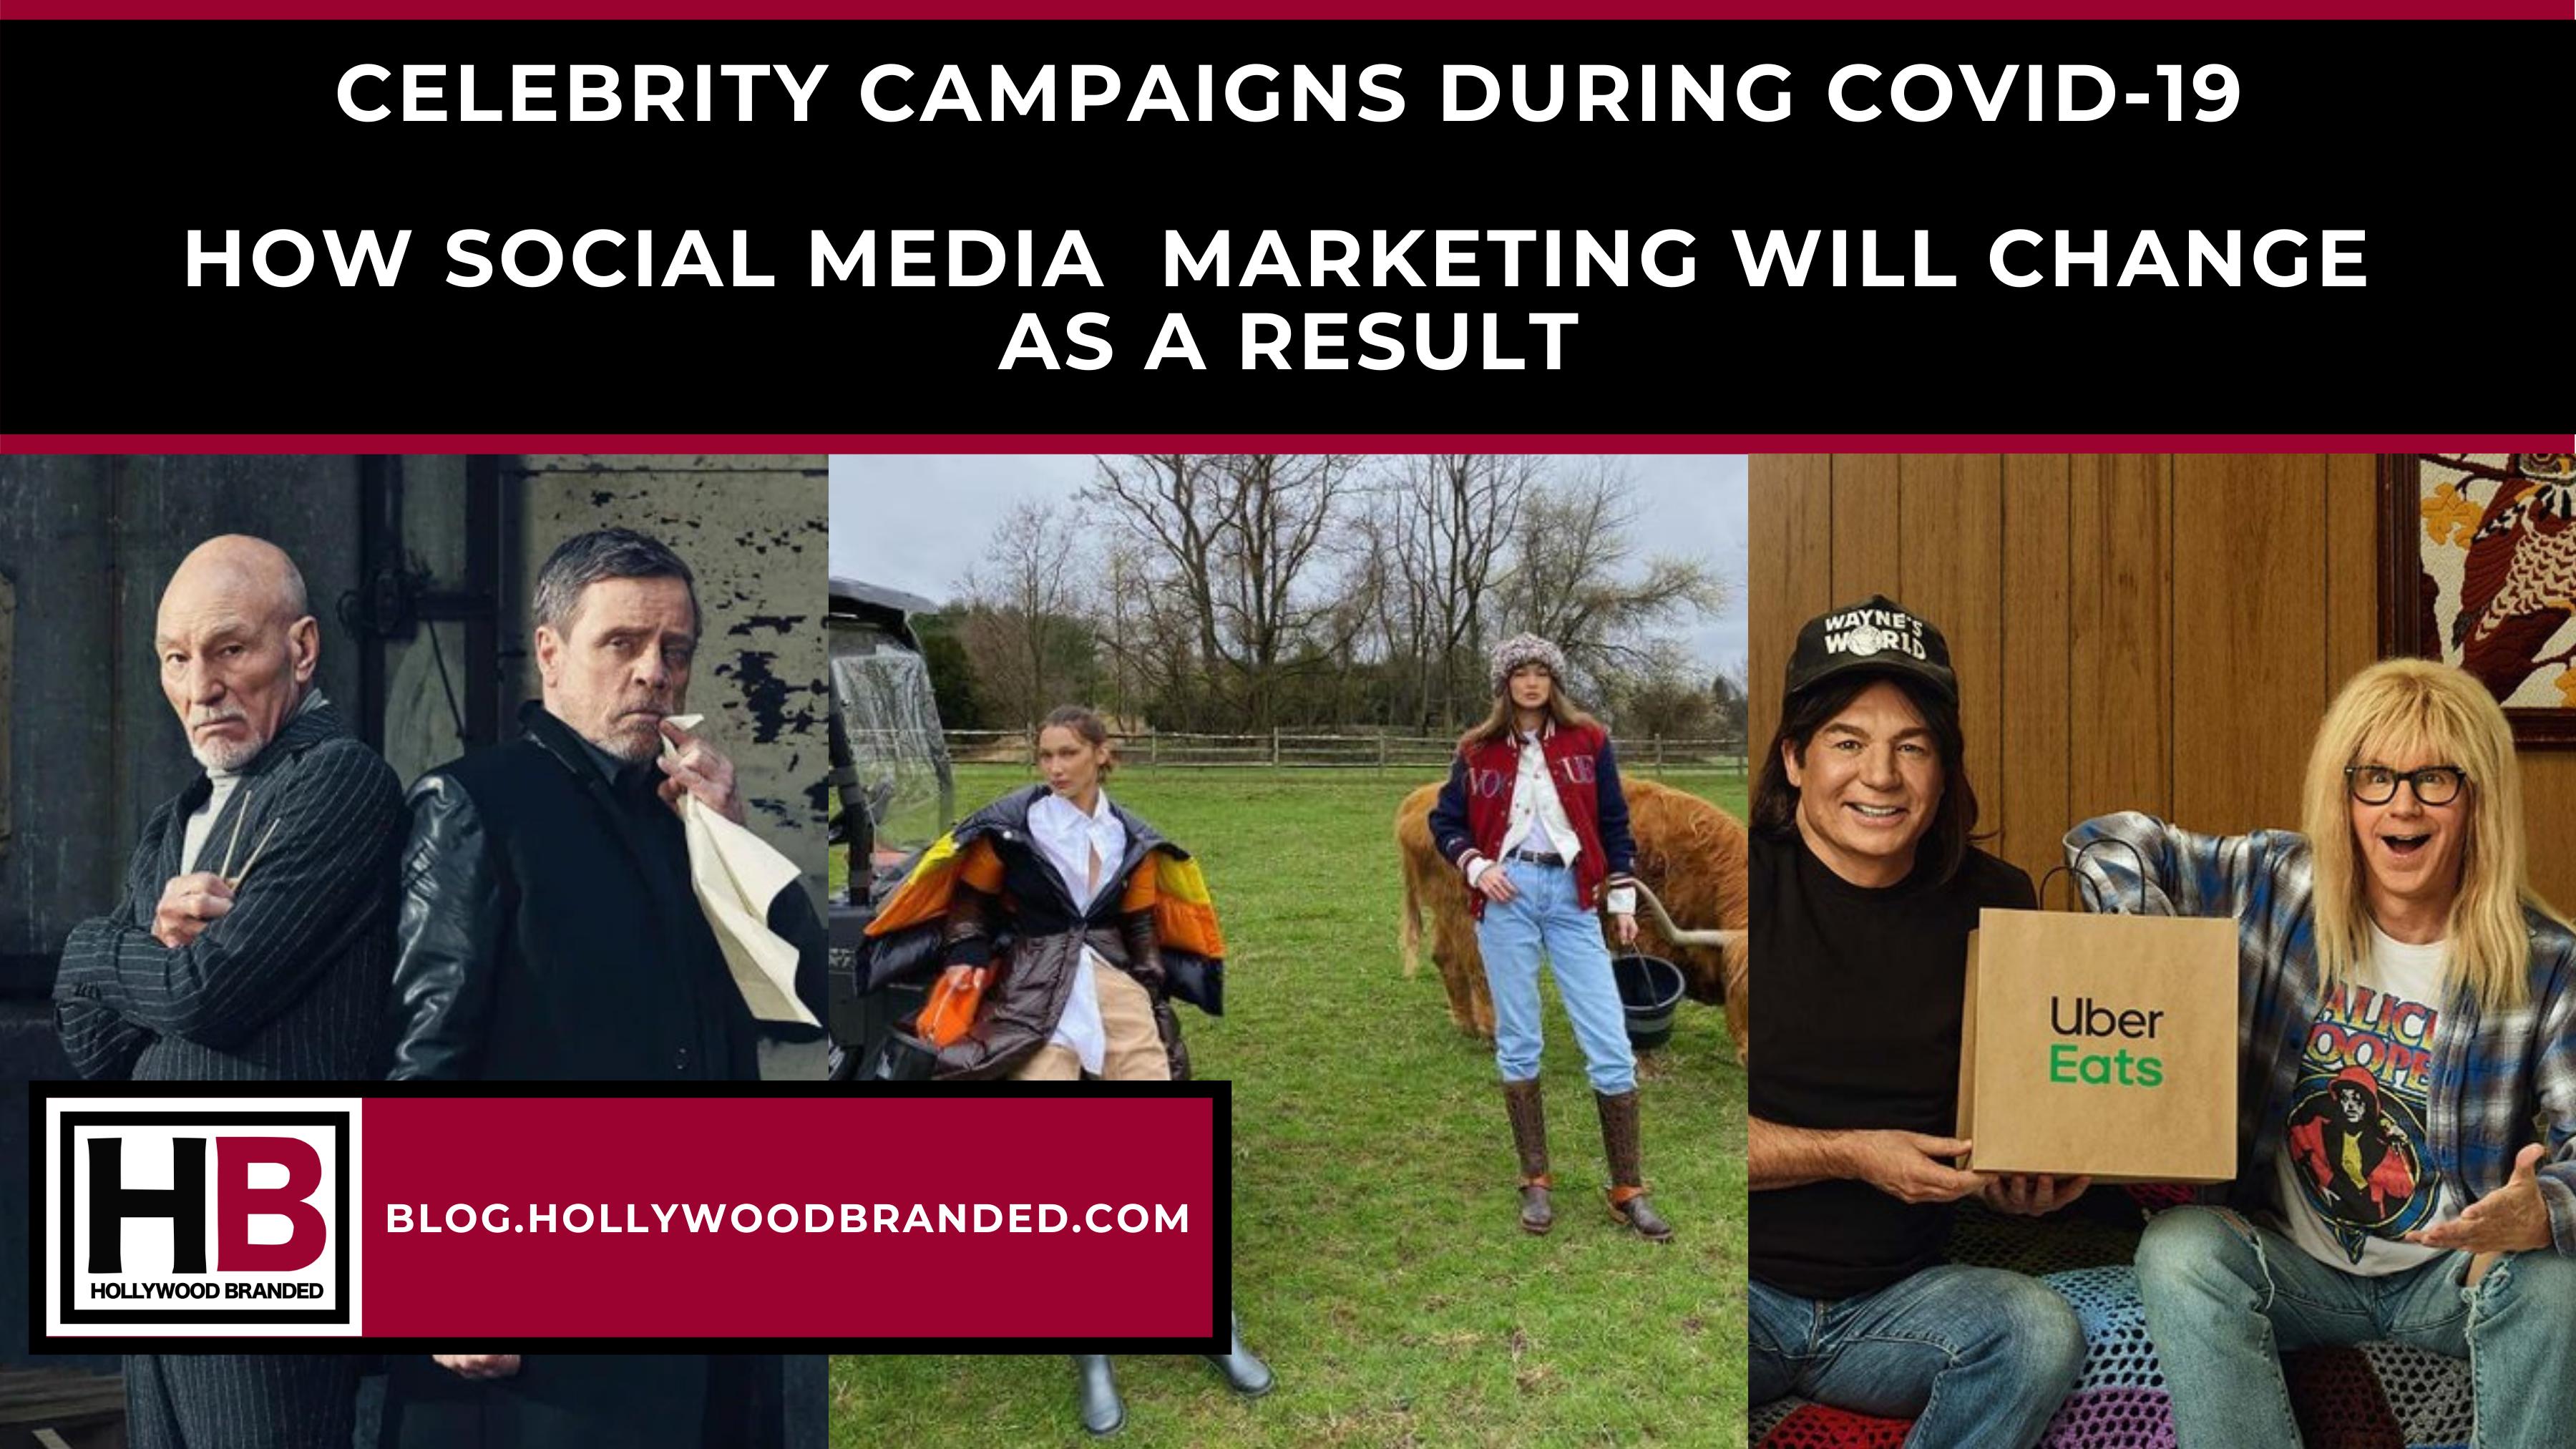 celebrity endorsements, covid-19, social media campaigns, celebrities, marketing, gigi hadid, bella hadid, vouge, mark hamill, patrick stewart, mike meyers, dana carvey, wayne's world, star wars, star trek